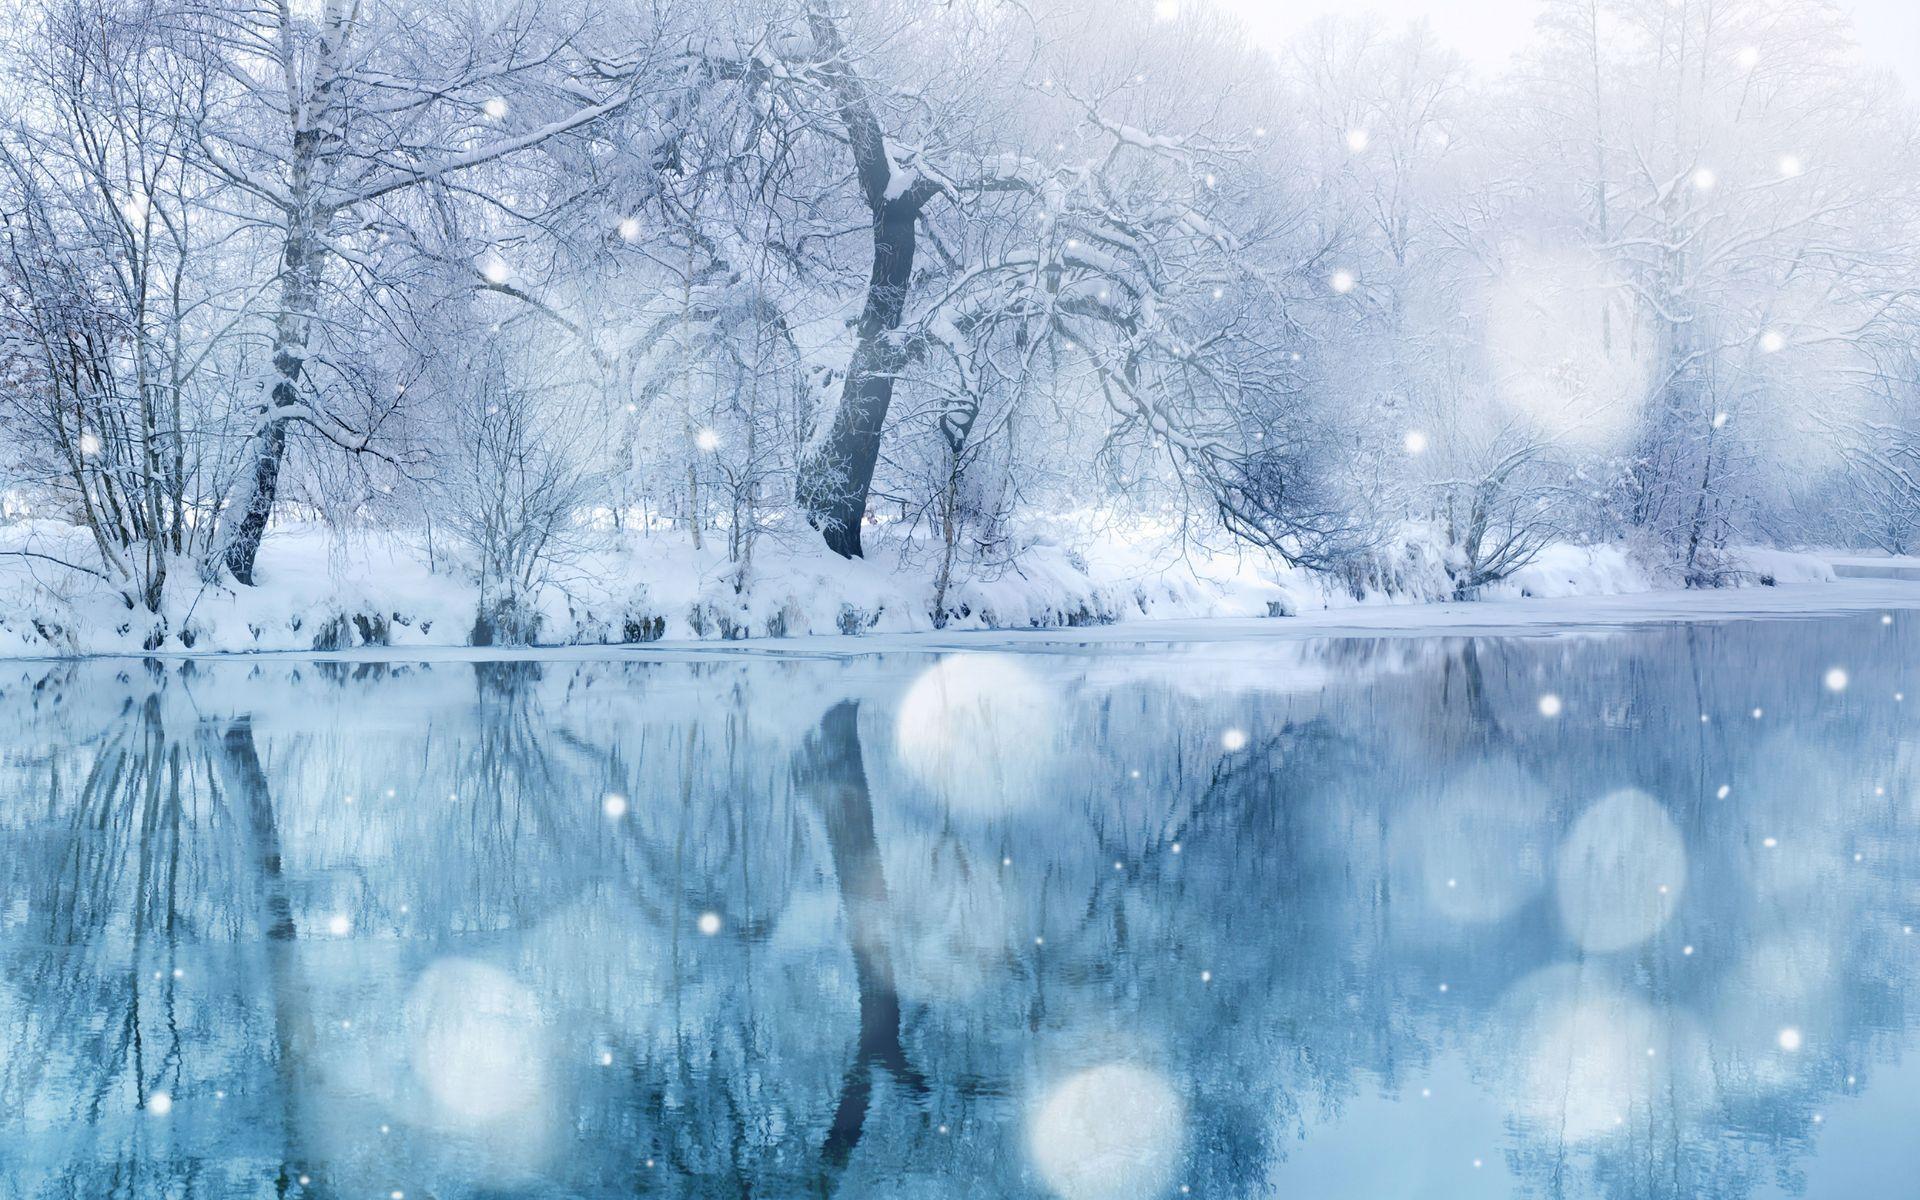 Snow River Winter Landscape Widescreen Wallpaper Winter Facebook Covers Winter Wallpaper Snowfall Wallpaper